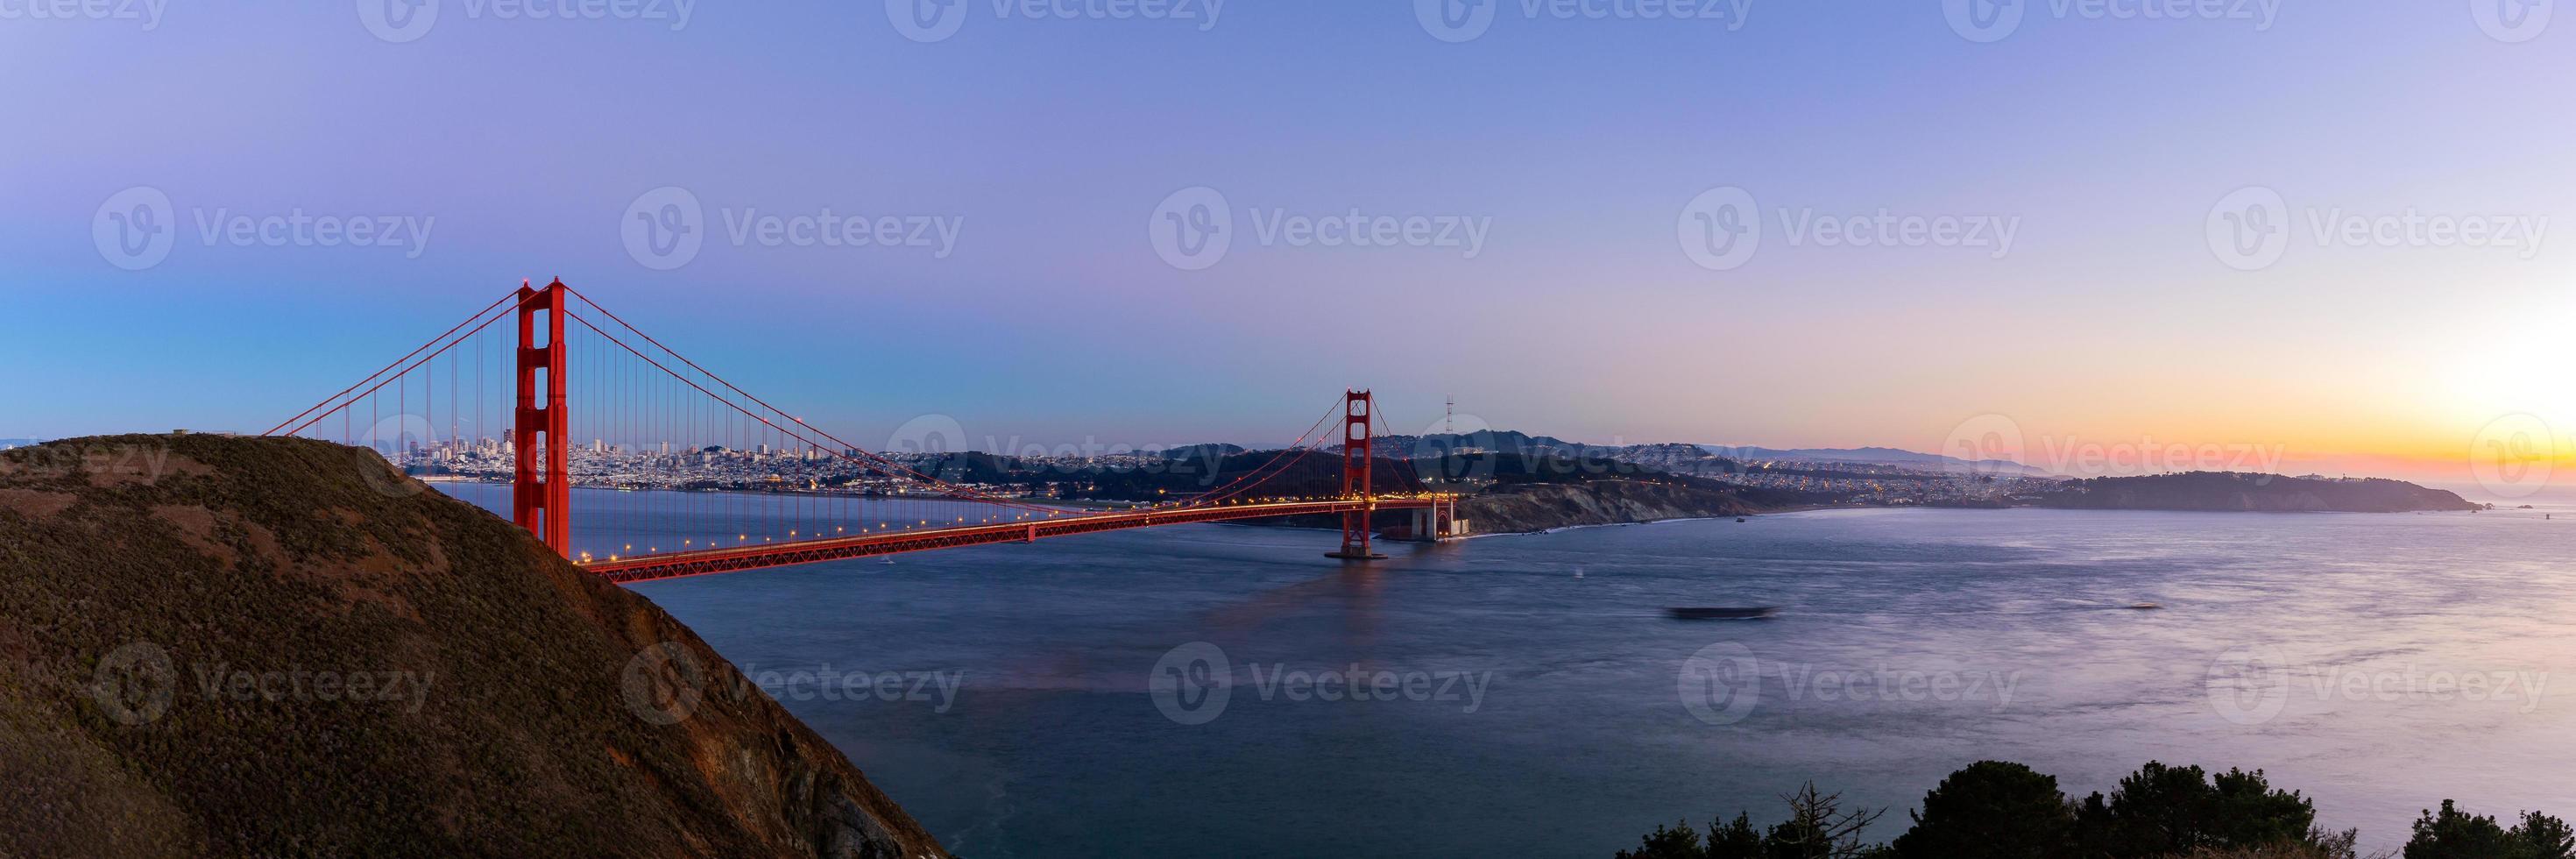 panoramisch uitzicht op de golden gate bridge, san francisco, usa foto